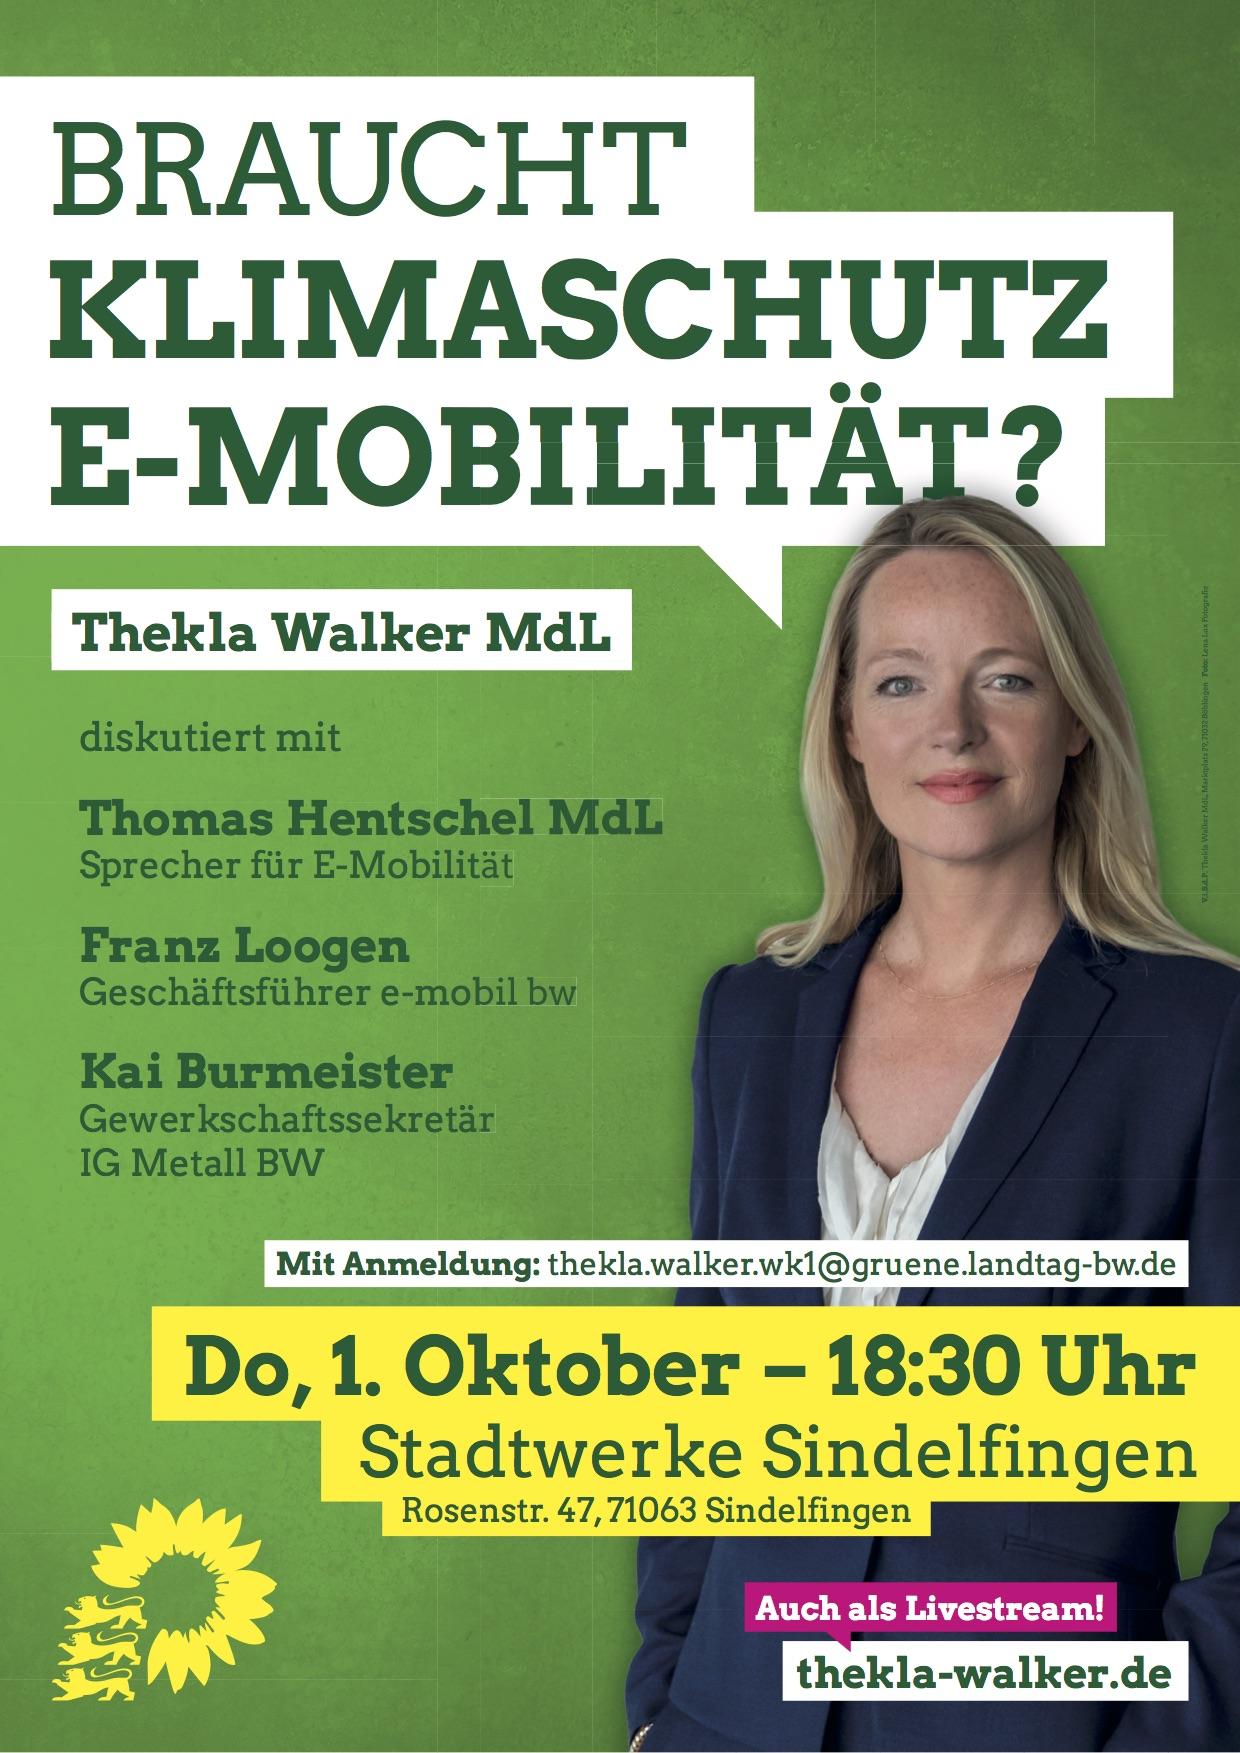 Braucht Klimaschutz E-Mobilität?